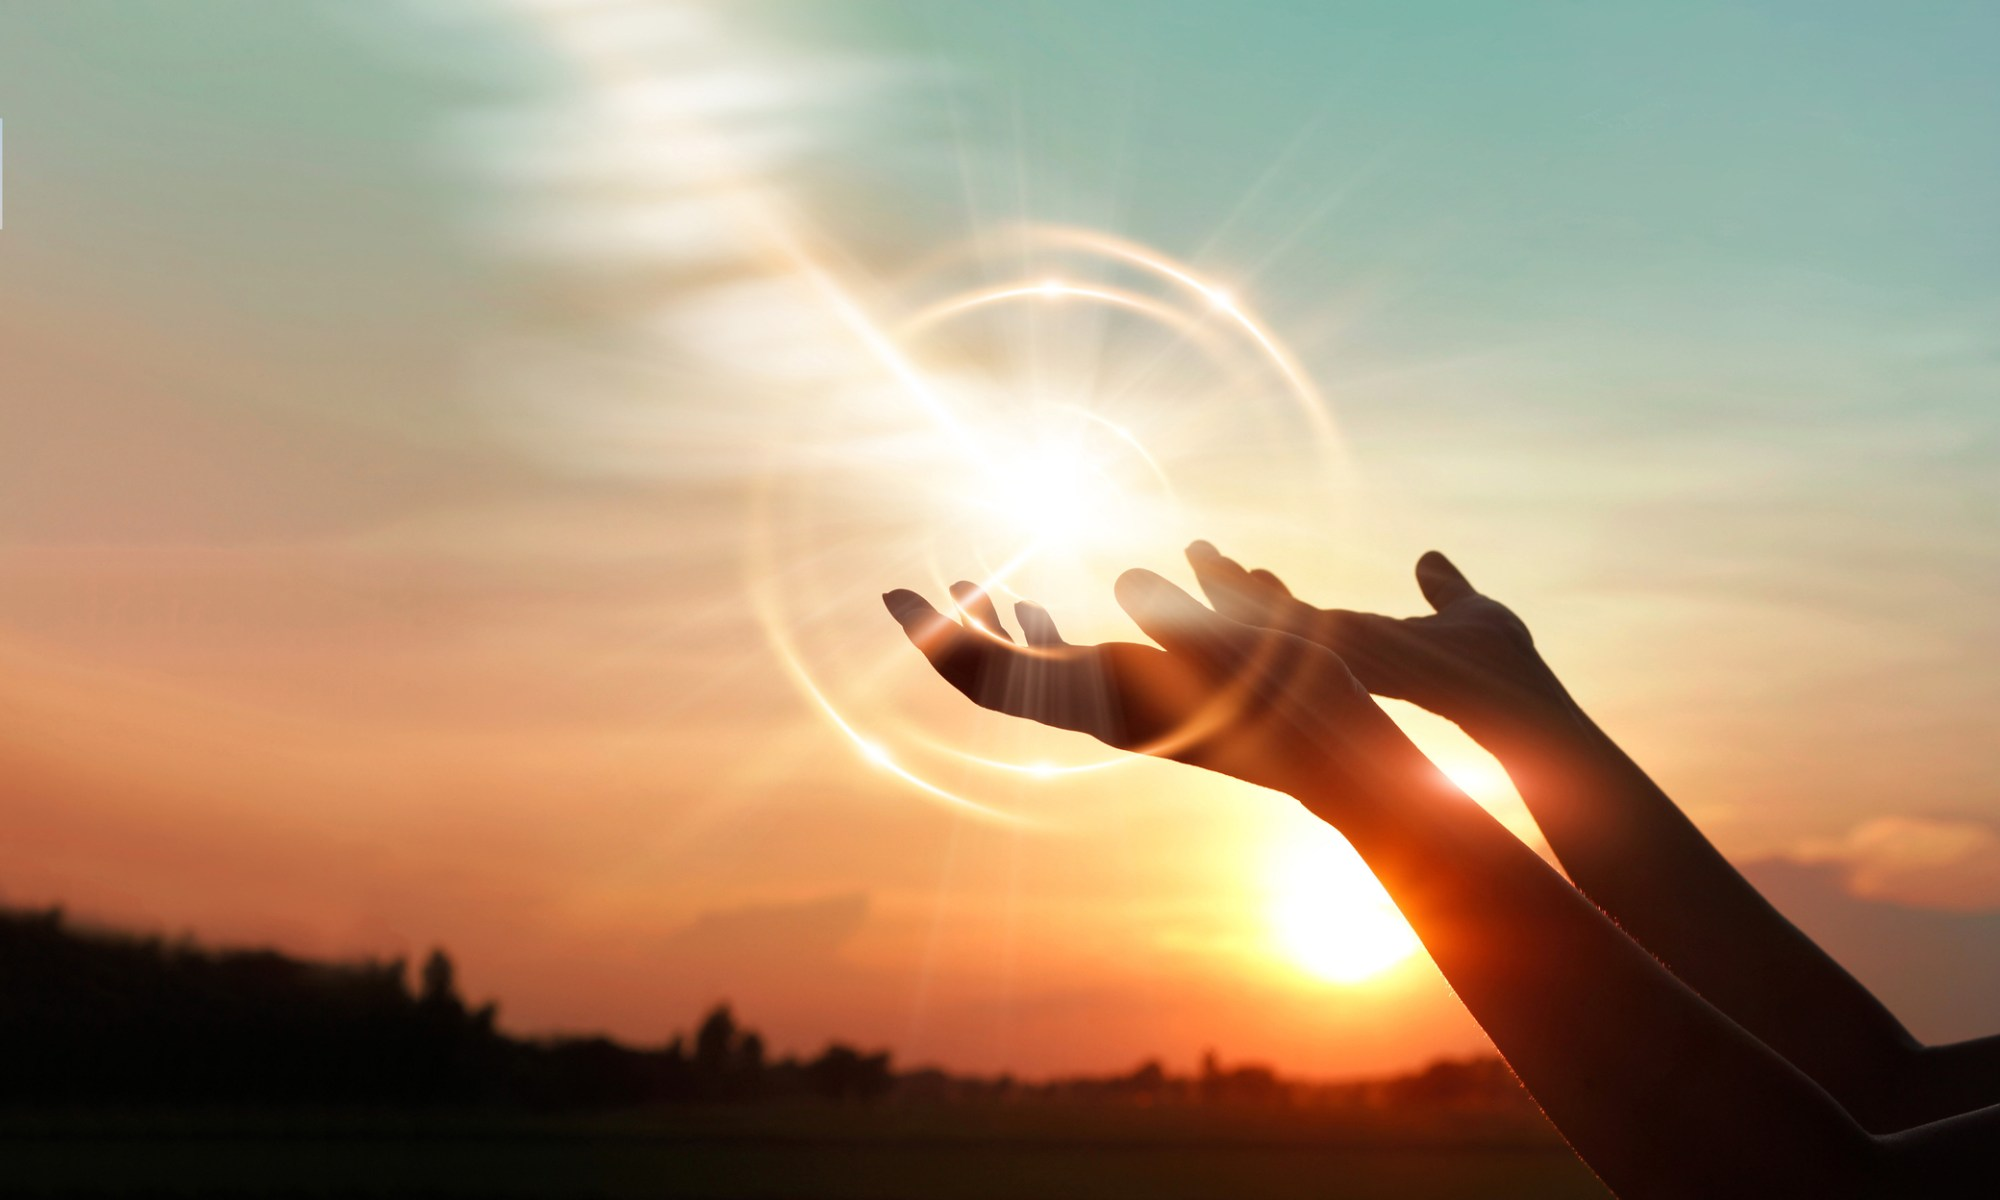 Hands receiving the holy spirit